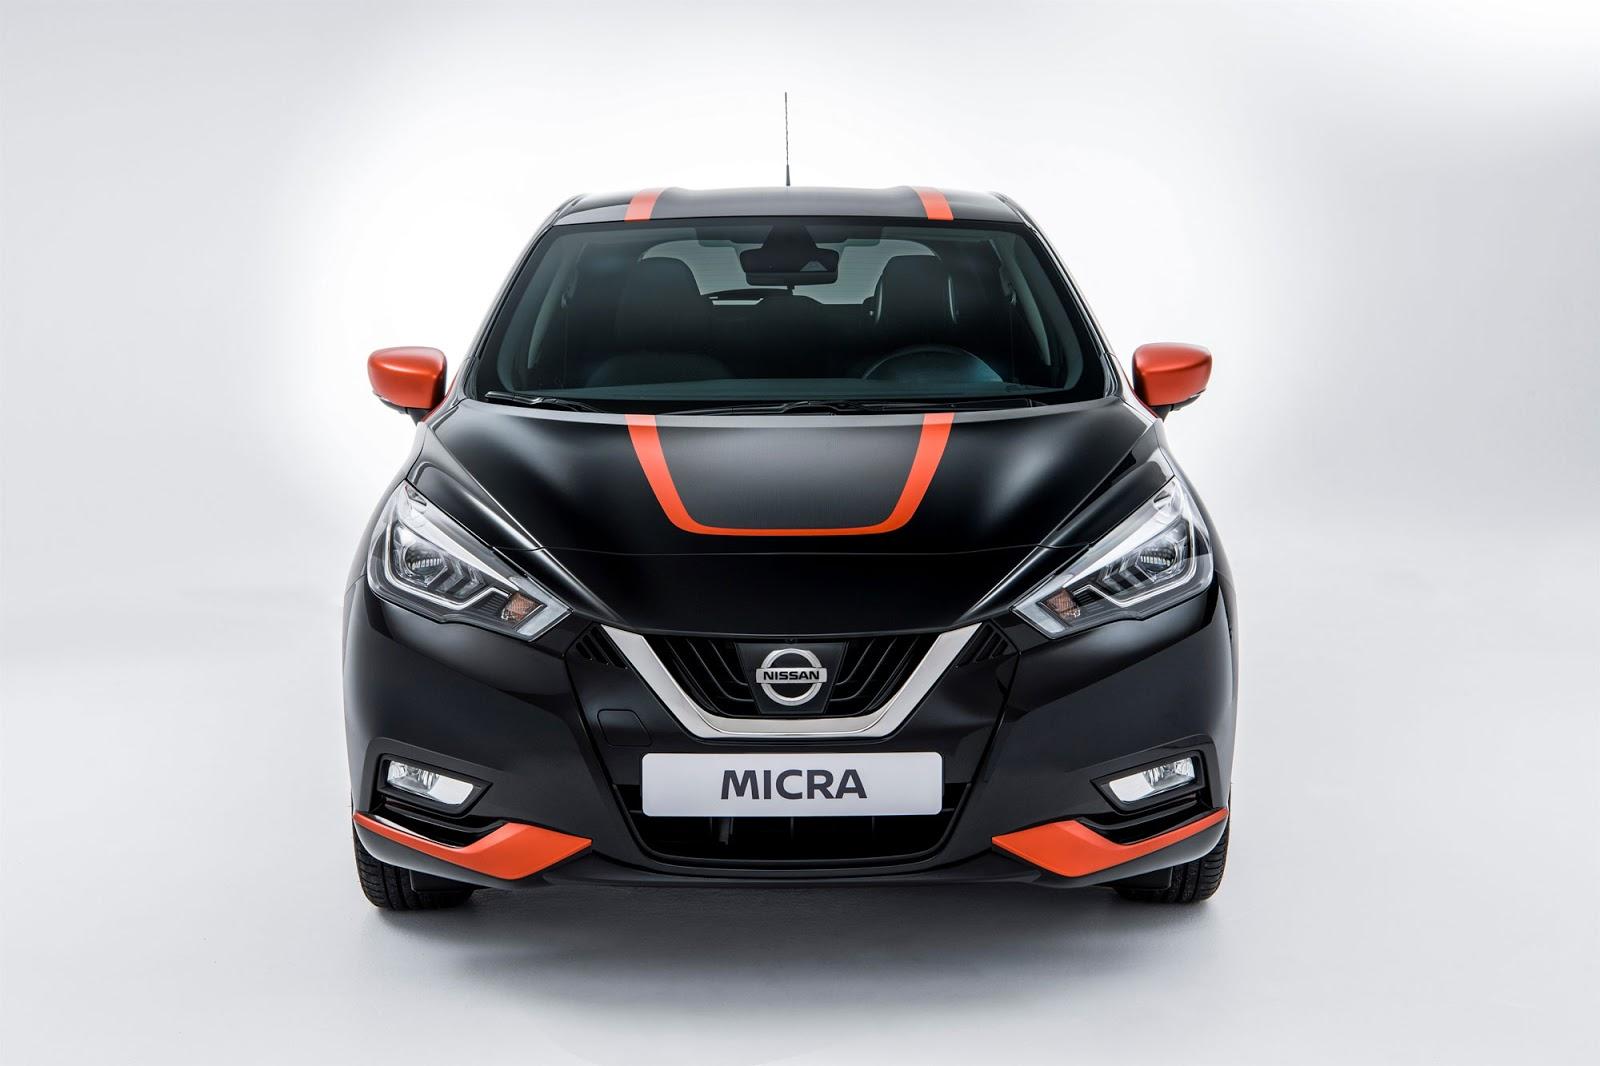 Nissan Micra BOSE® Personal Edition: Εκλεκτικός σχεδιασμός και ζωντανός ήχος